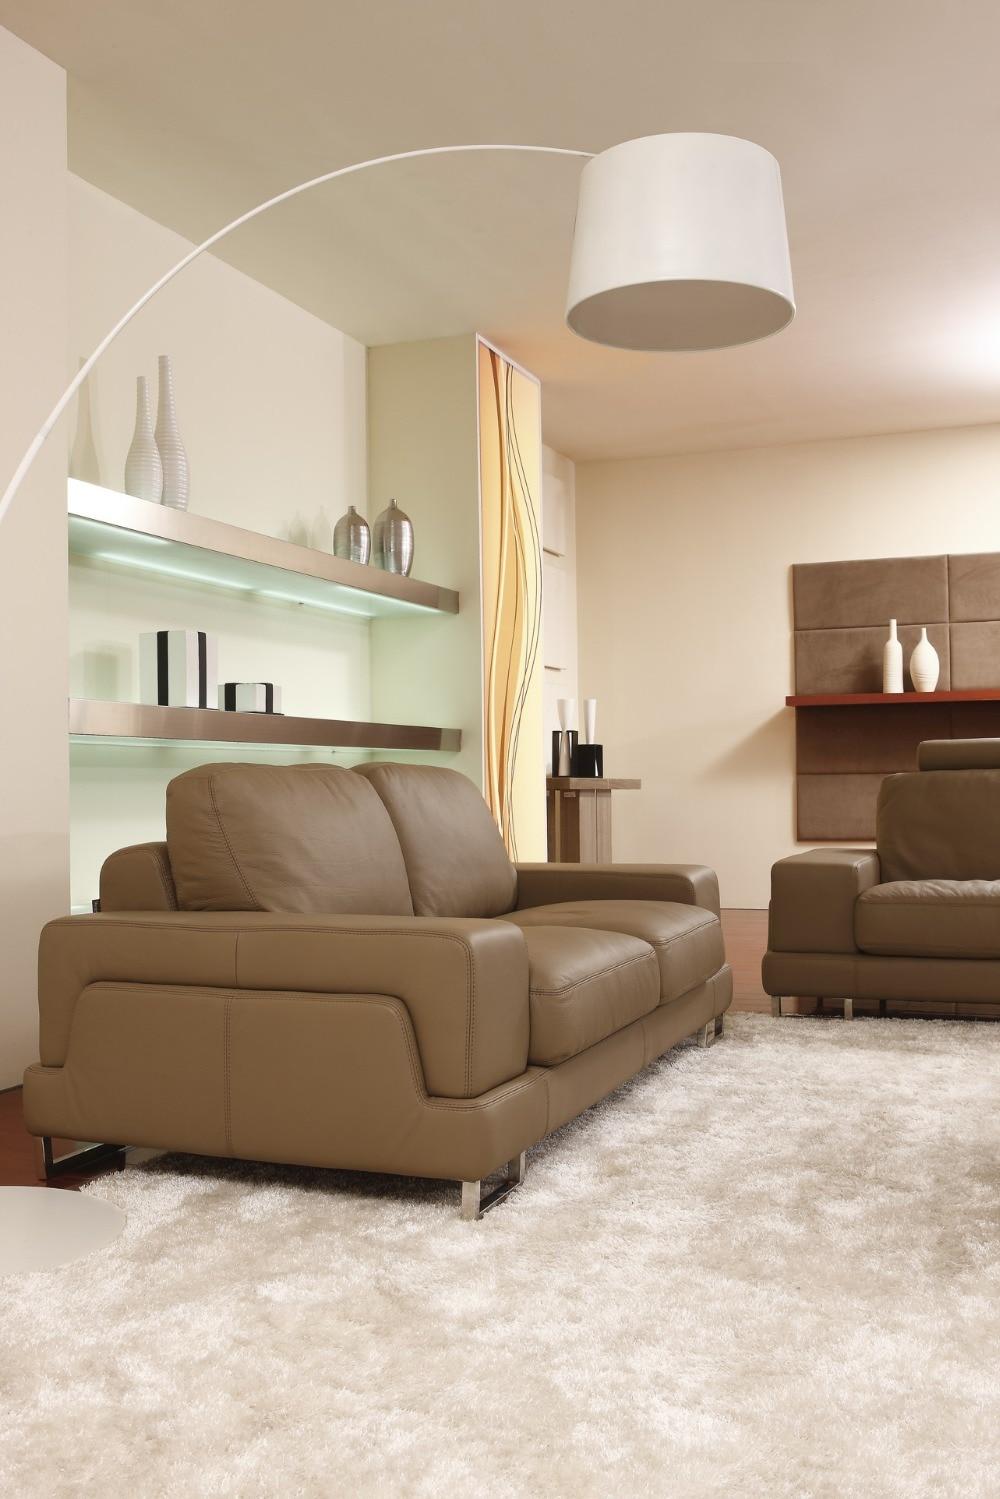 Quality Living Room Furniture Aliexpresscom Buy 8265 Living Room Leather Sofas High Quality